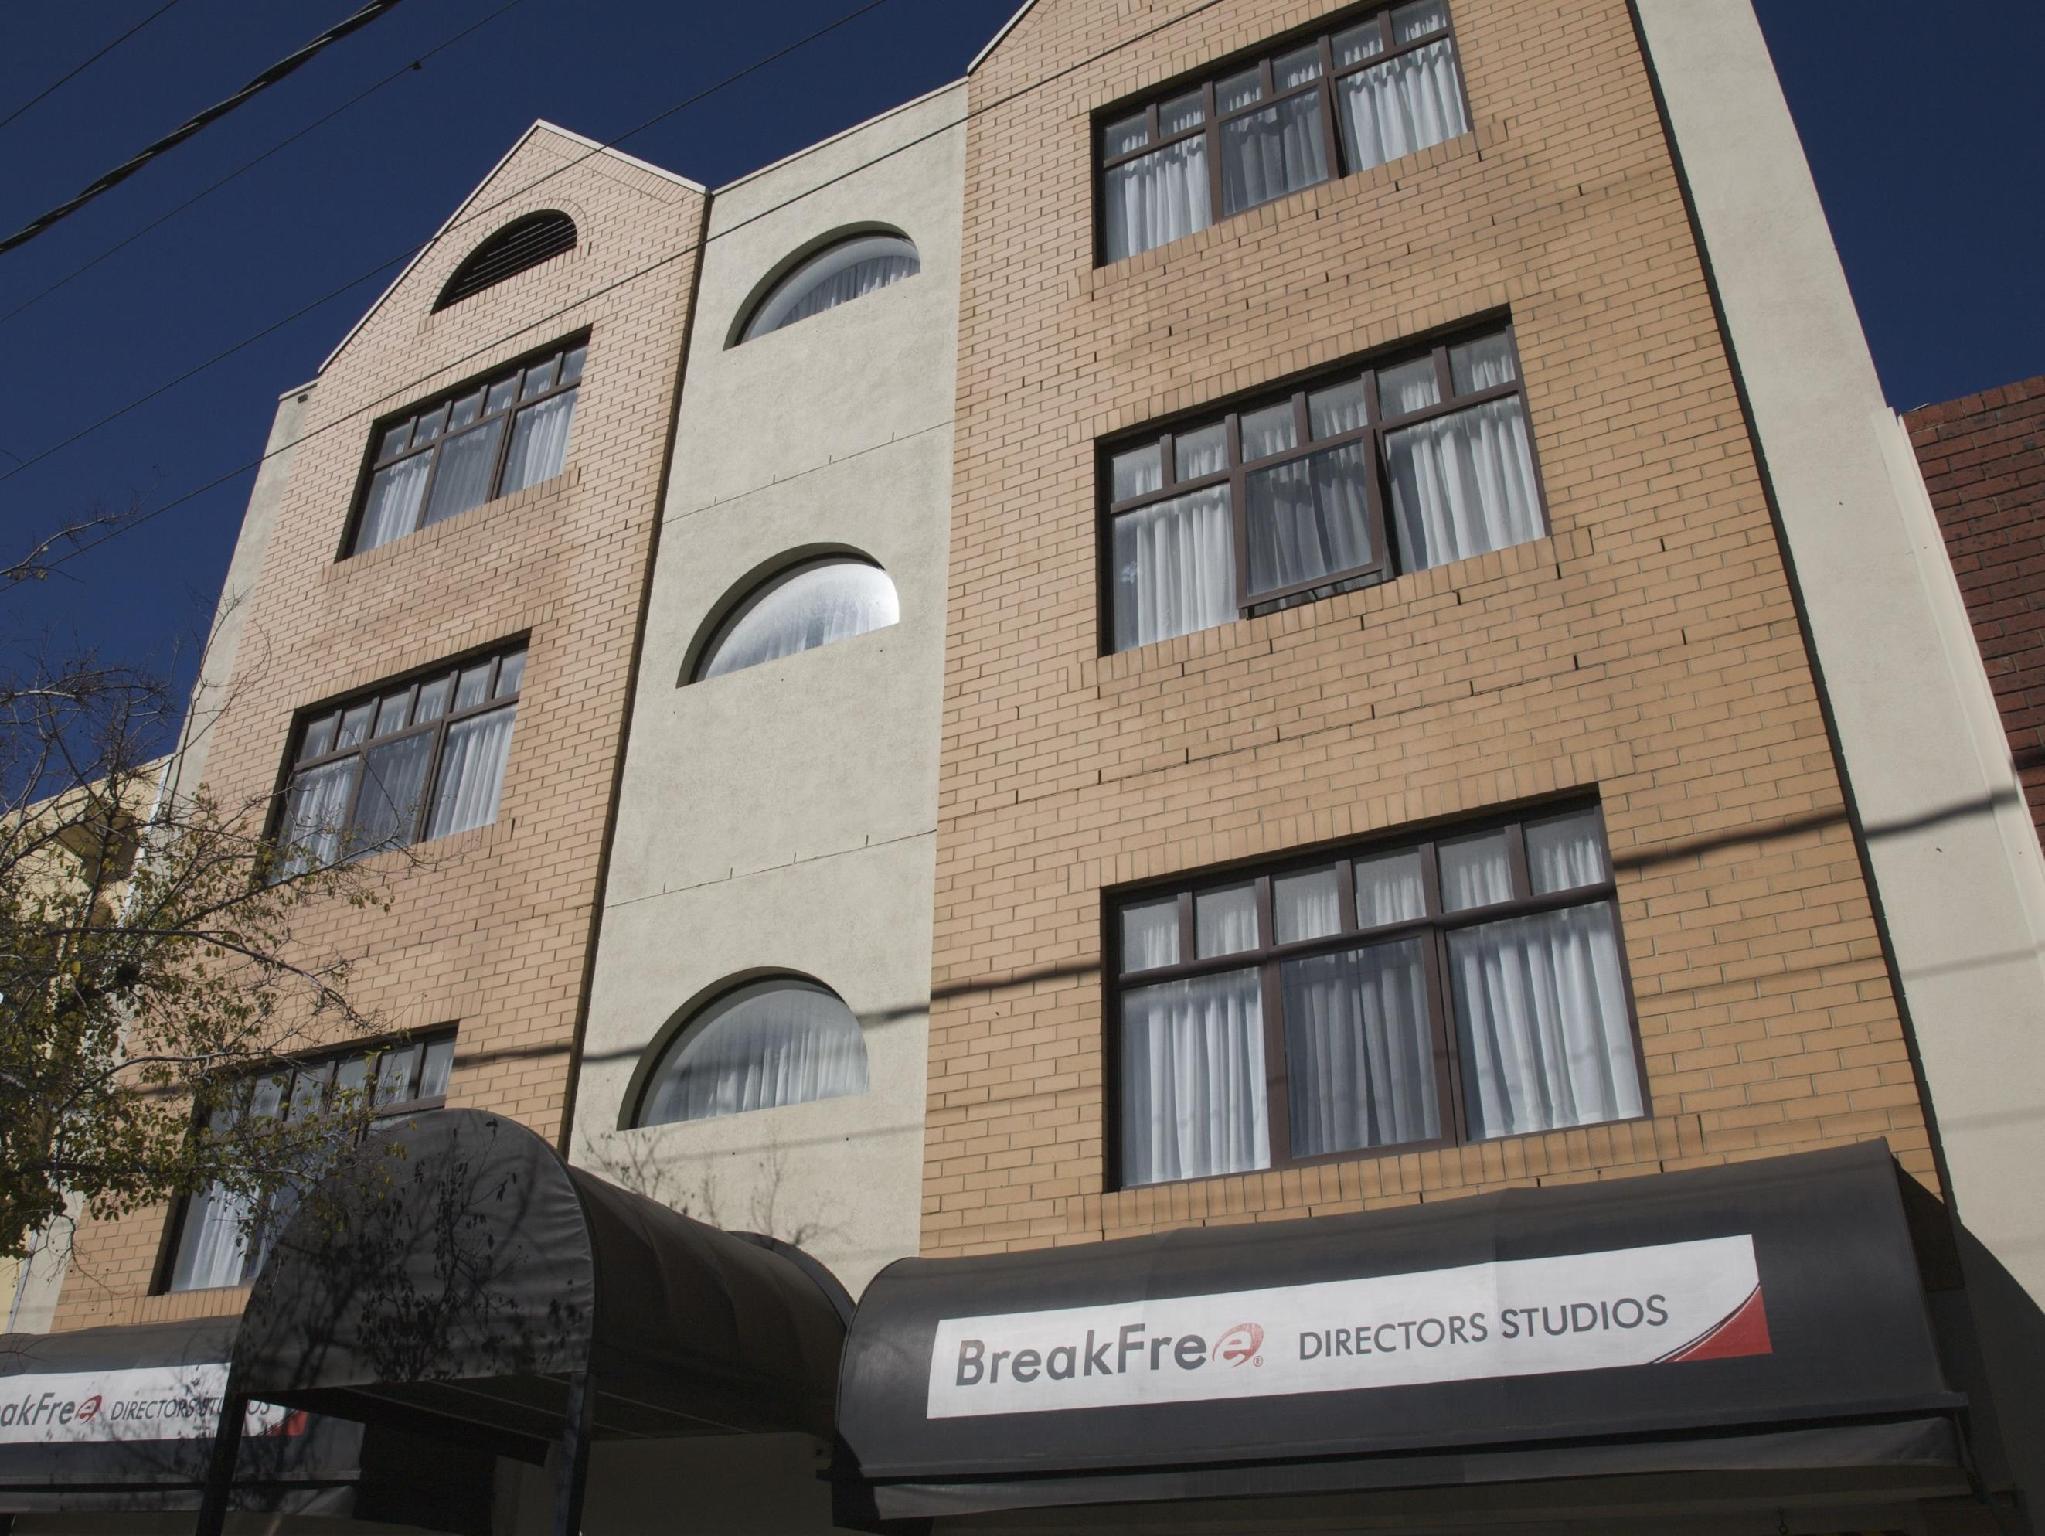 BreakFree Directors Studios Hotel Adelaide - Exterior